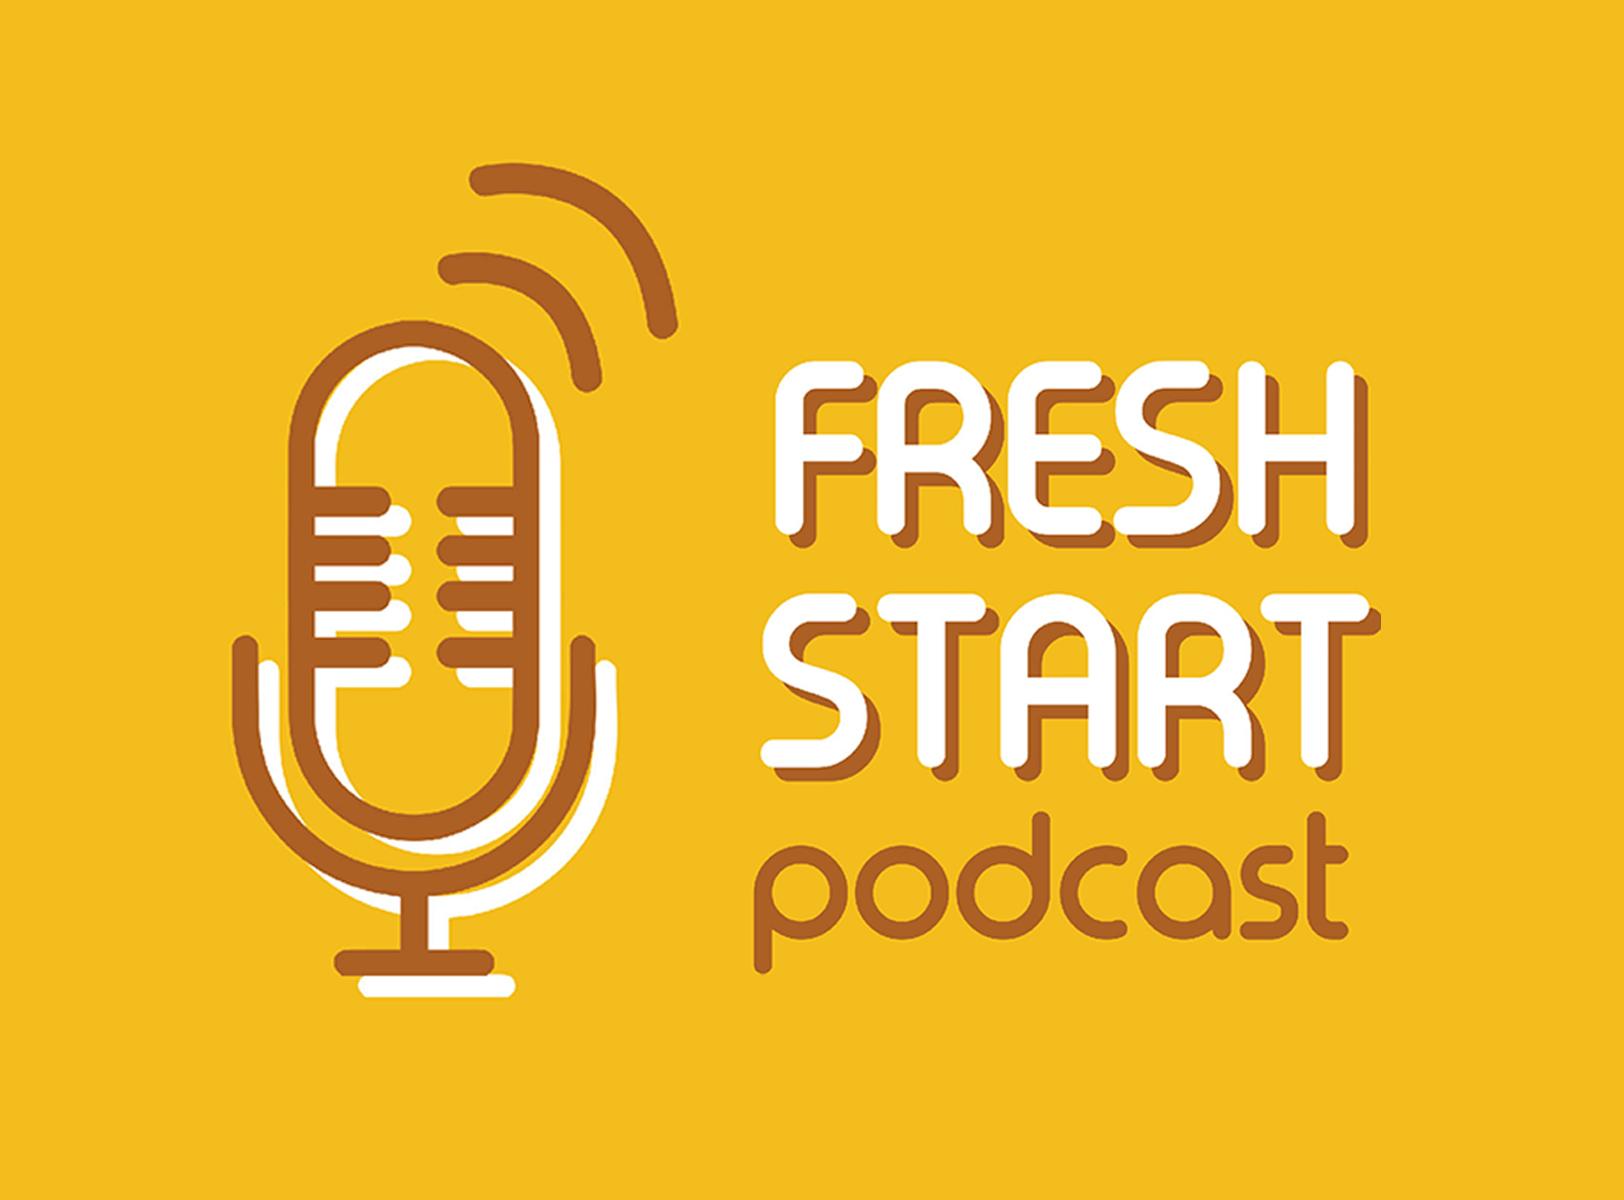 Fresh Start: Podcast News (7/17/2019 Wed.)